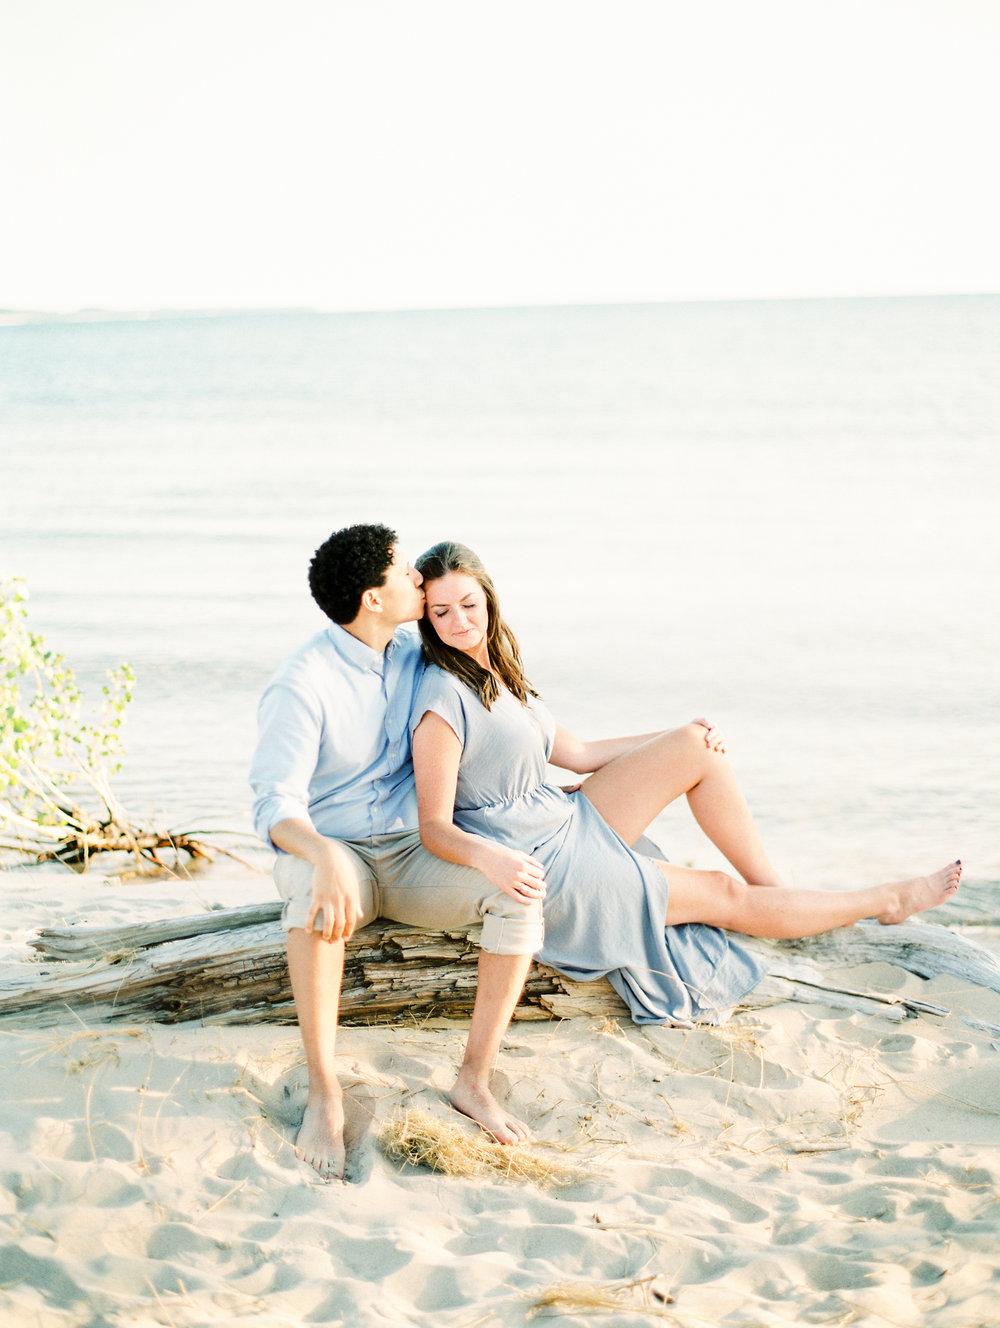 Lucie+Anthony+Engaged-45.jpg